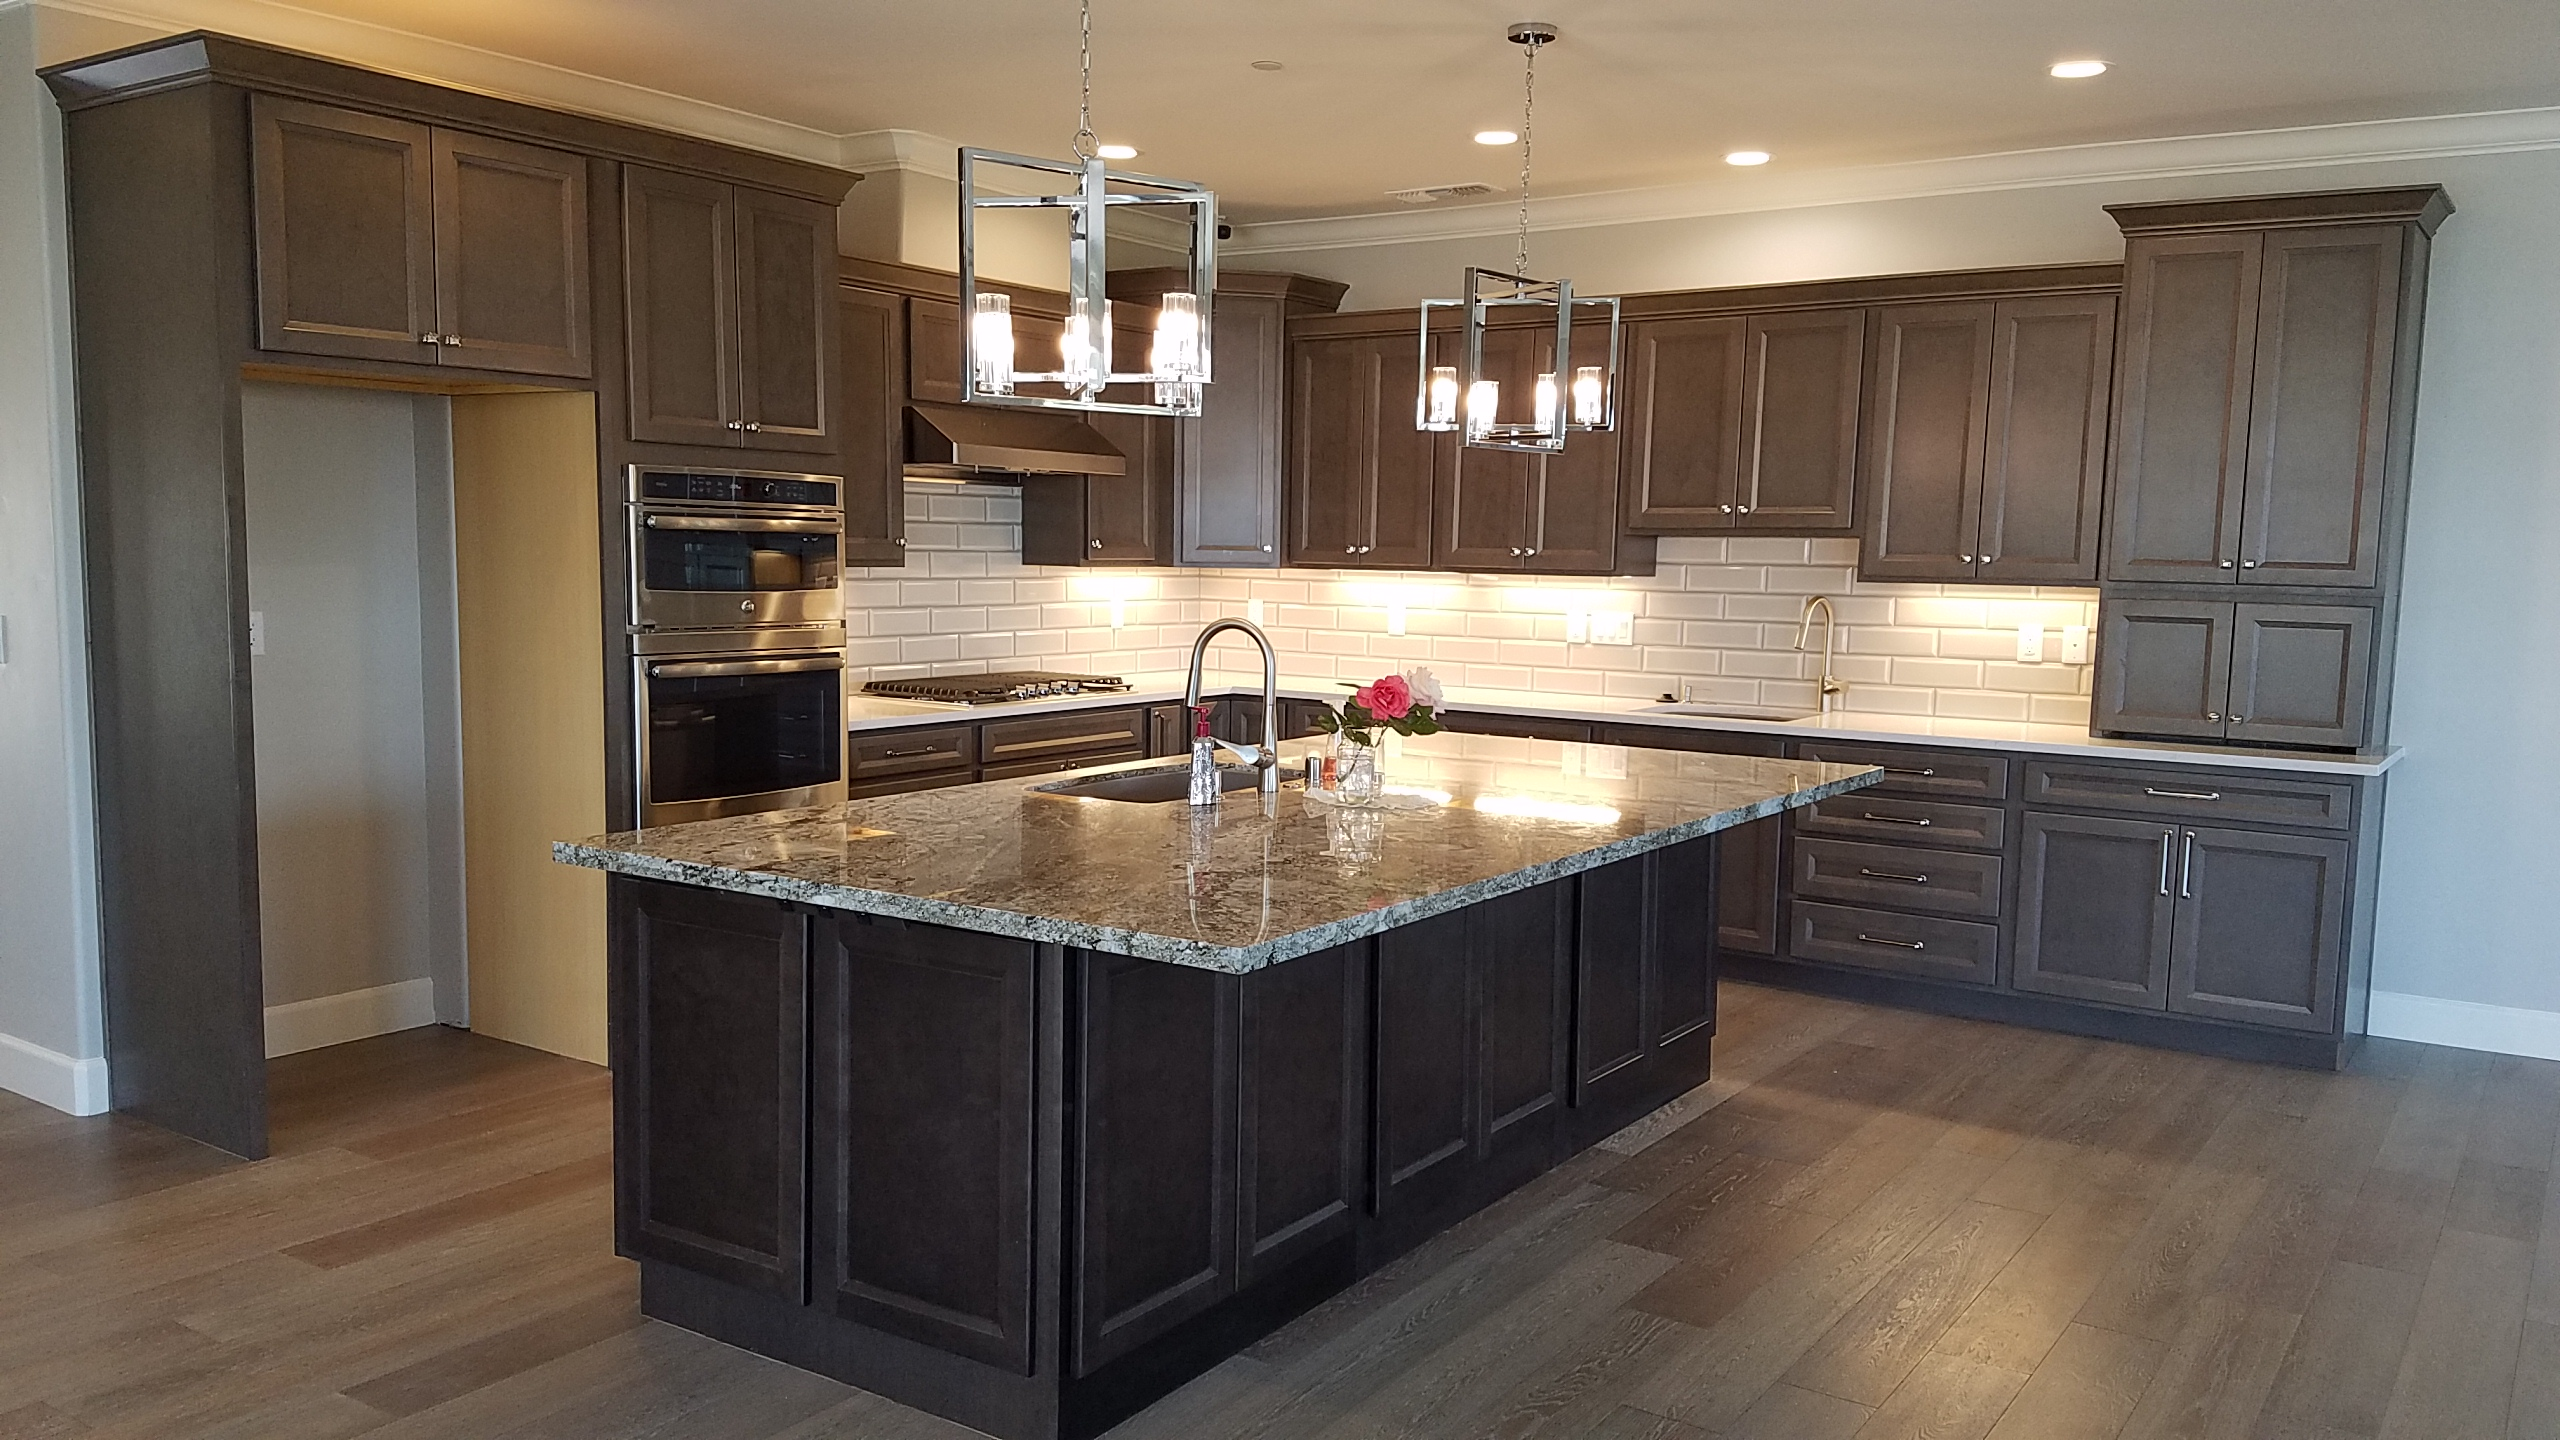 Kitchen island, dark grey cabinets and grey/white counters